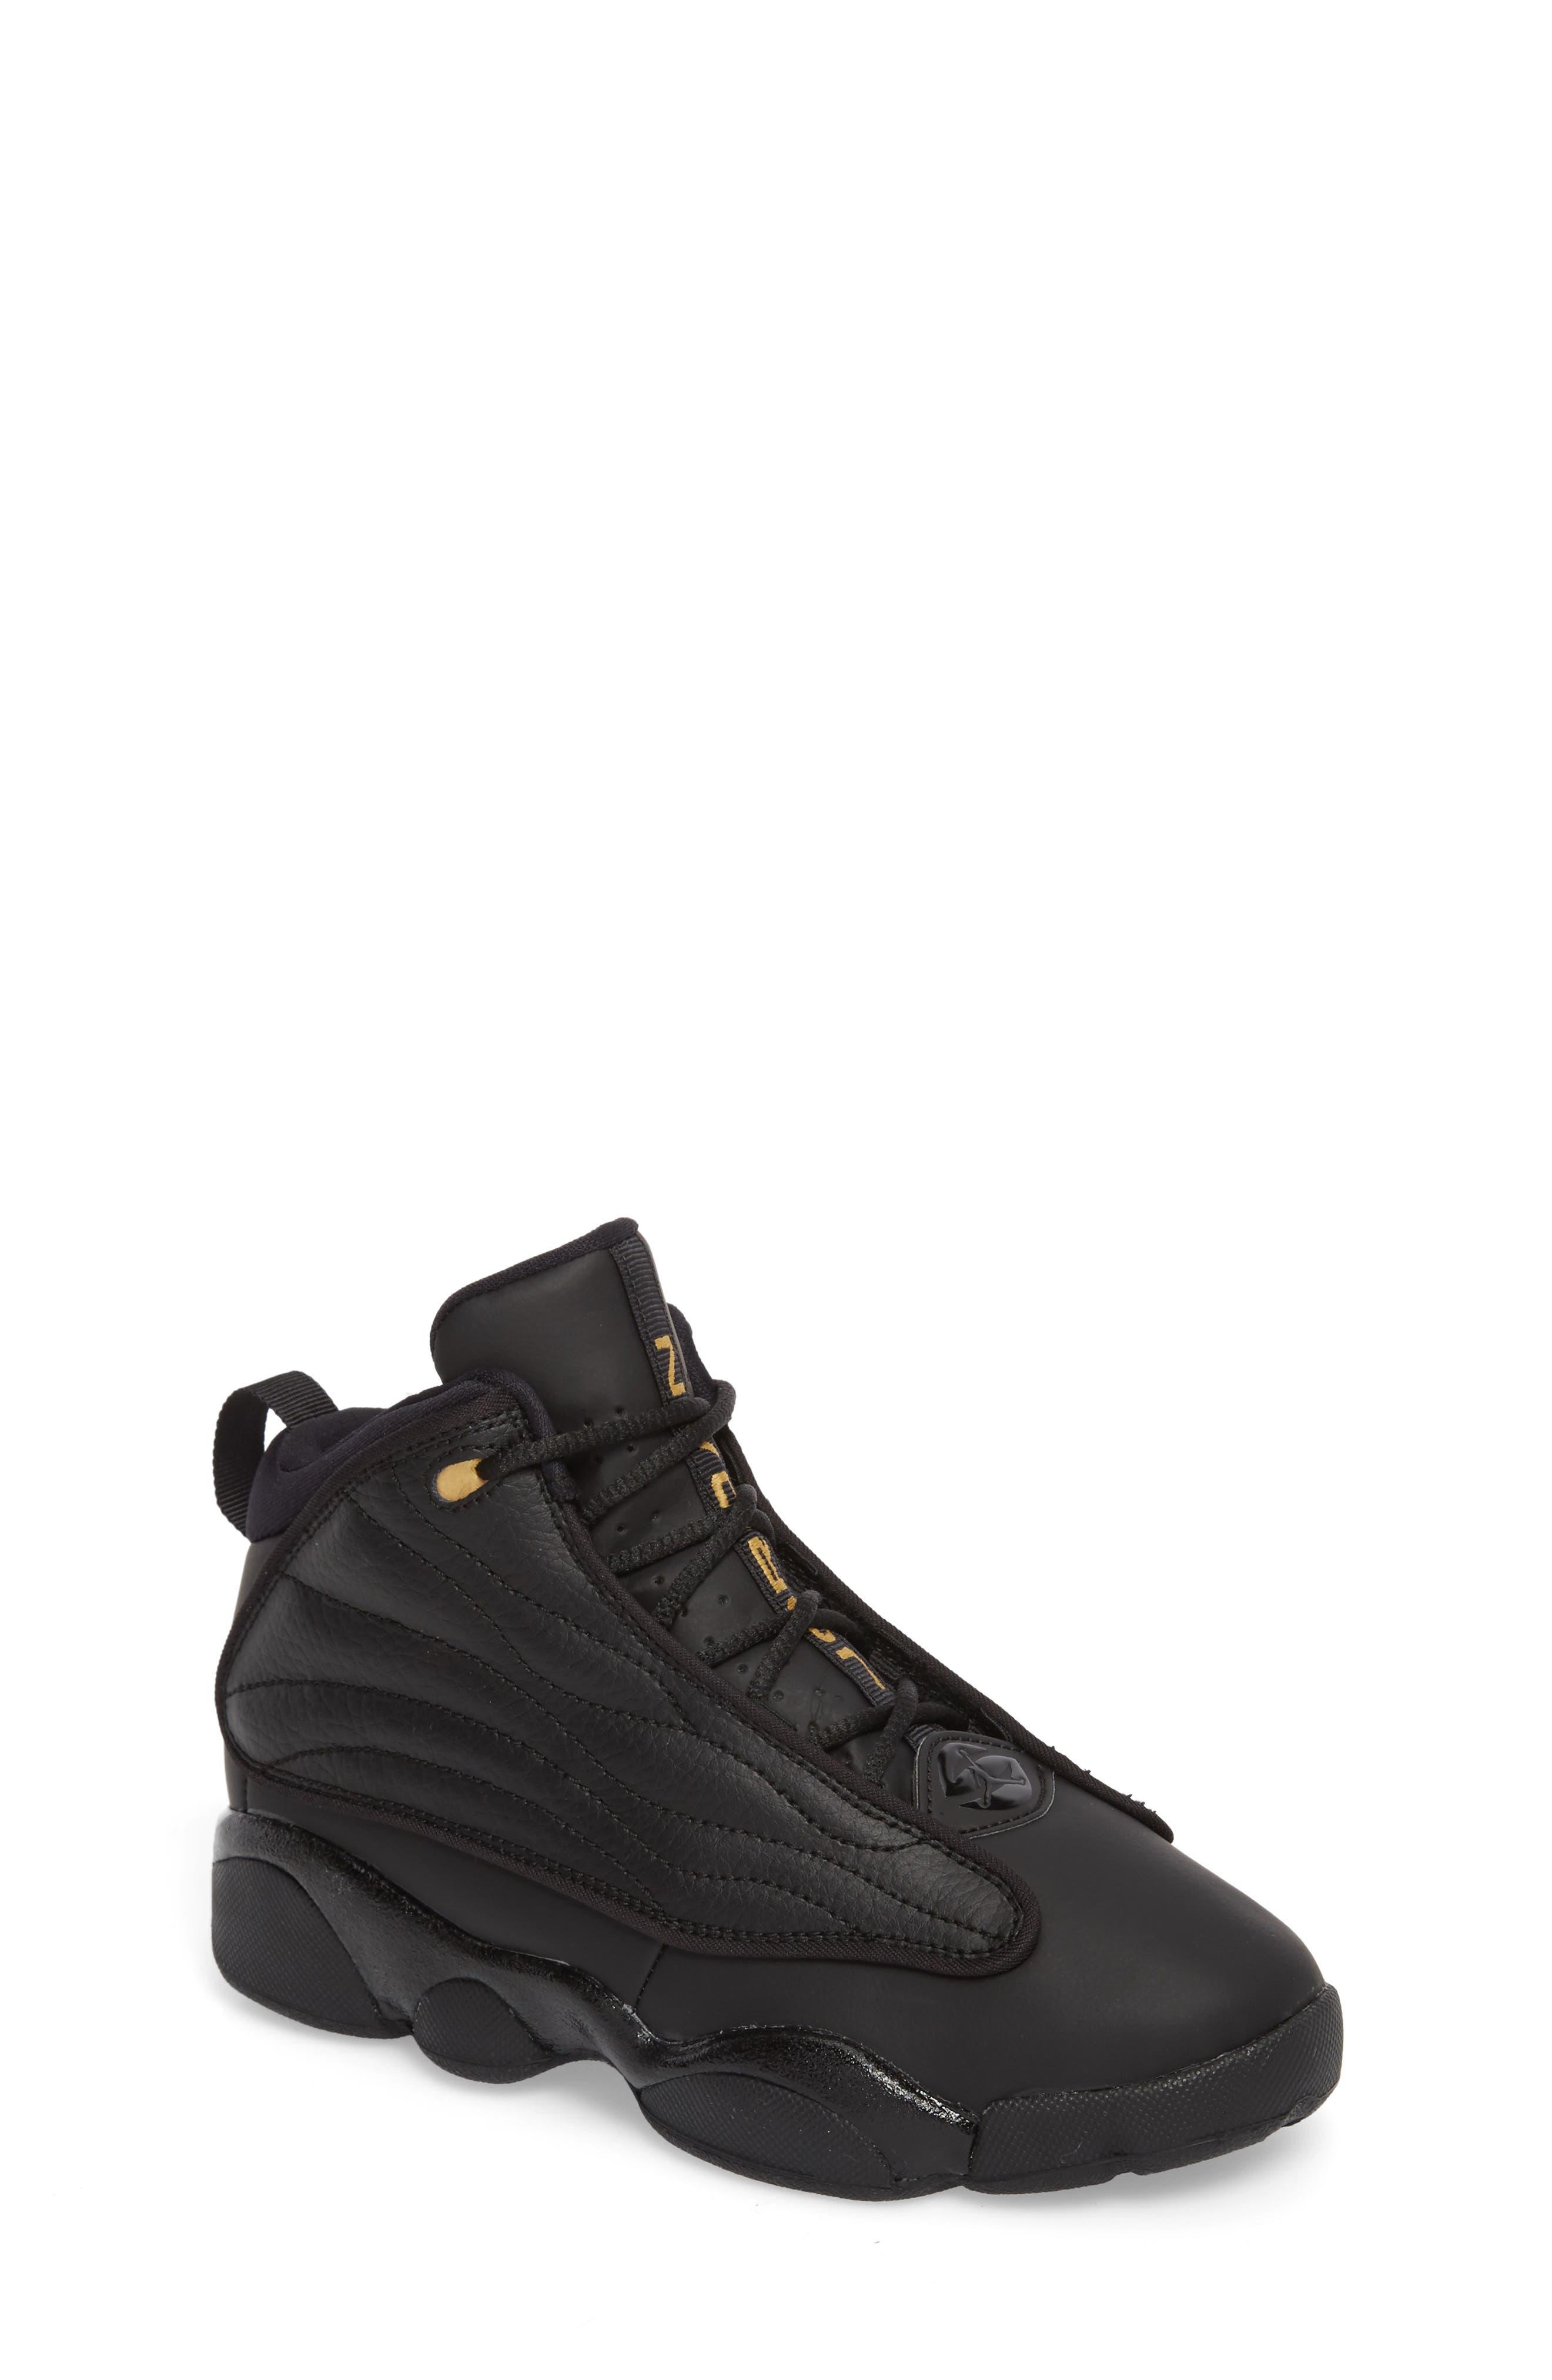 Pro Strong BP High Top Sneaker,                         Main,                         color, Black/ Black